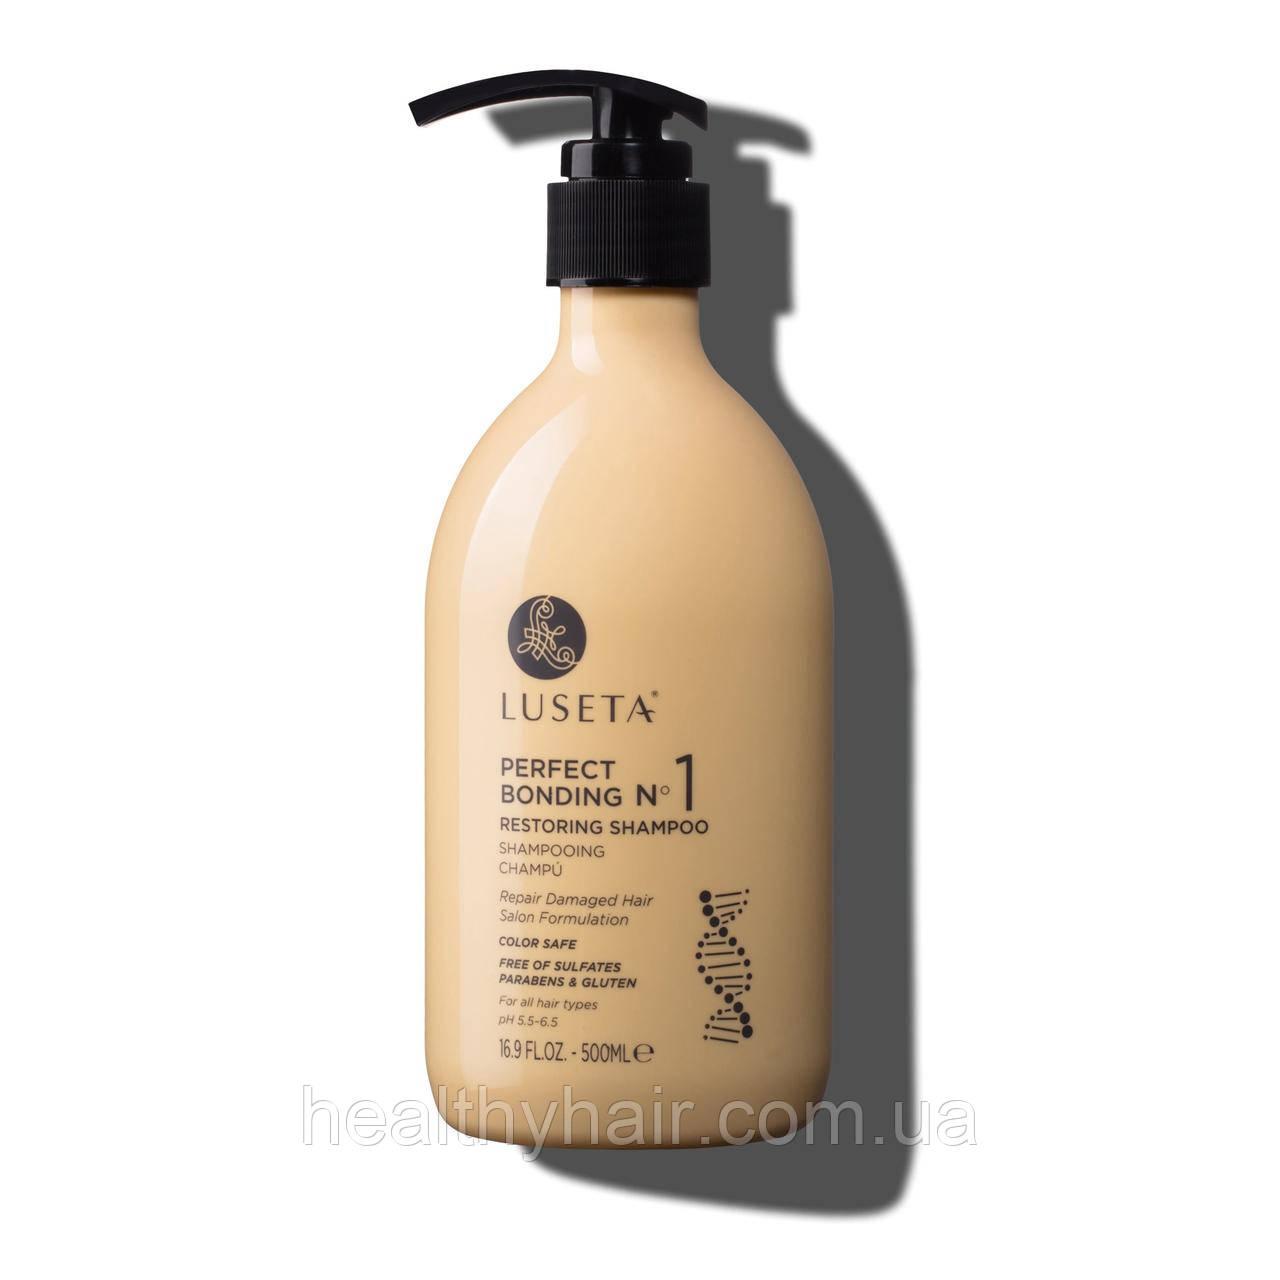 Шампунь для всех типов волос Luseta Perfect Bonding Shampoo 500 ml